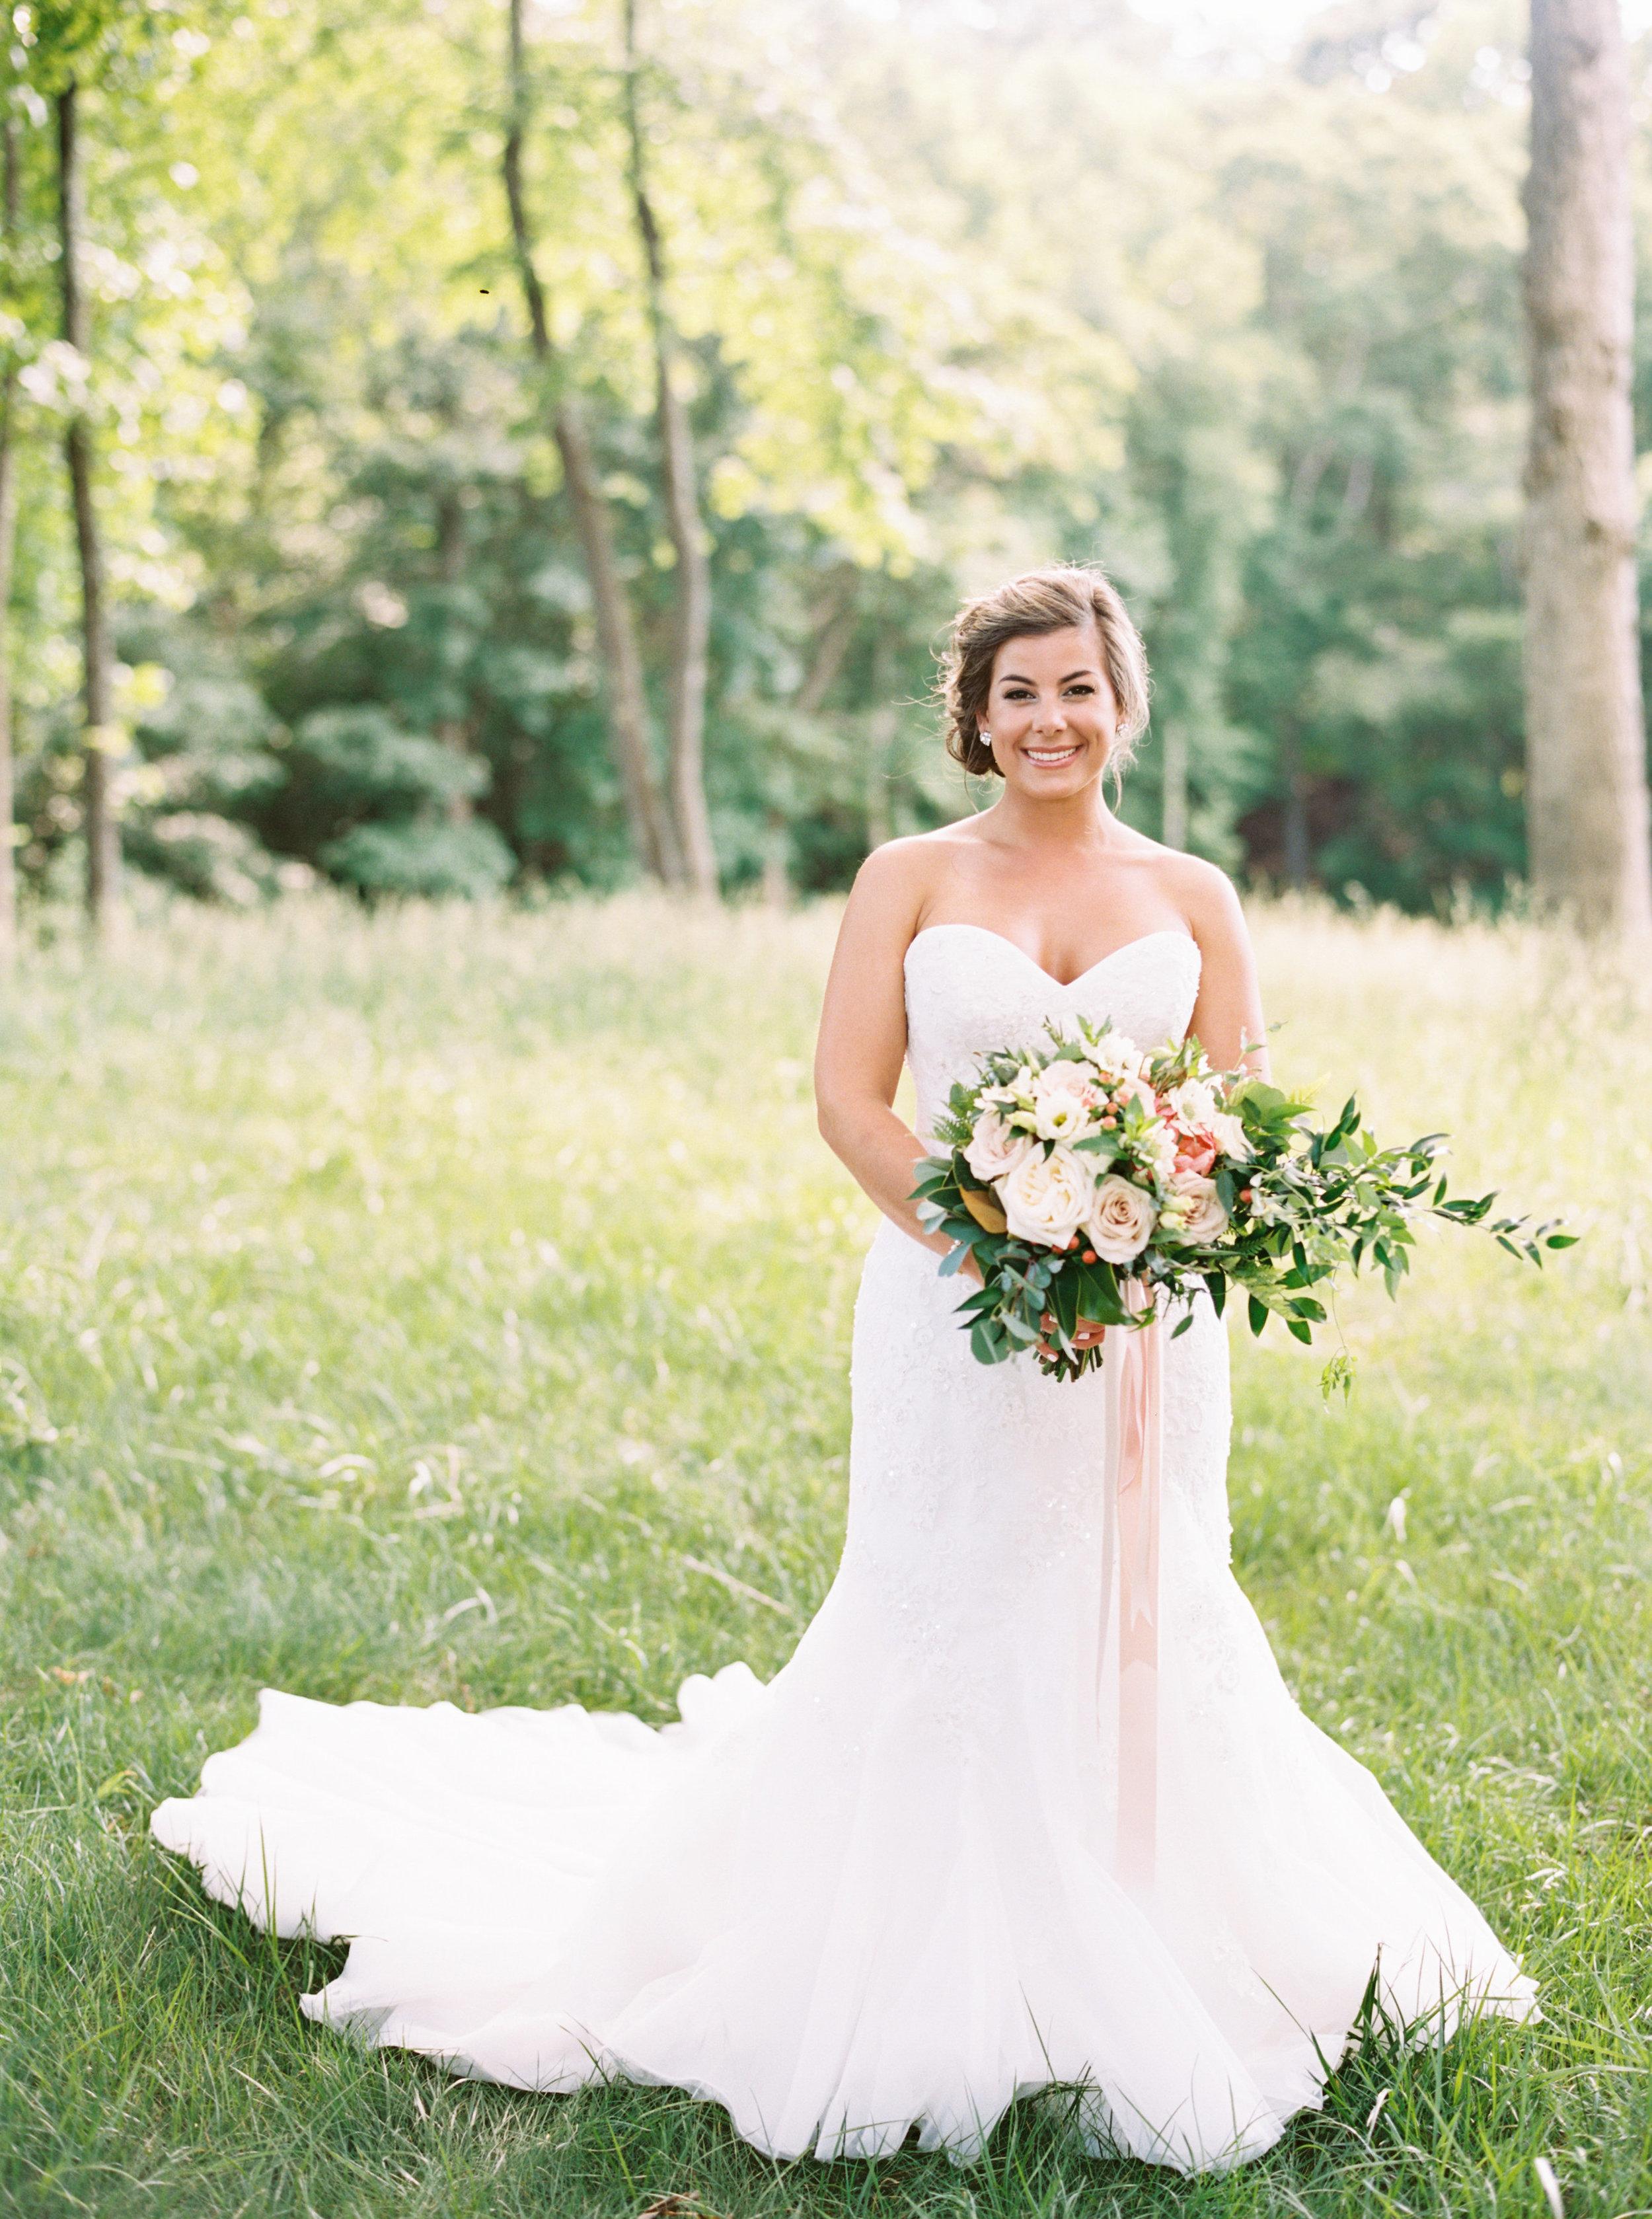 Durham Wedding, Bridal bouquet with trailing ribbons